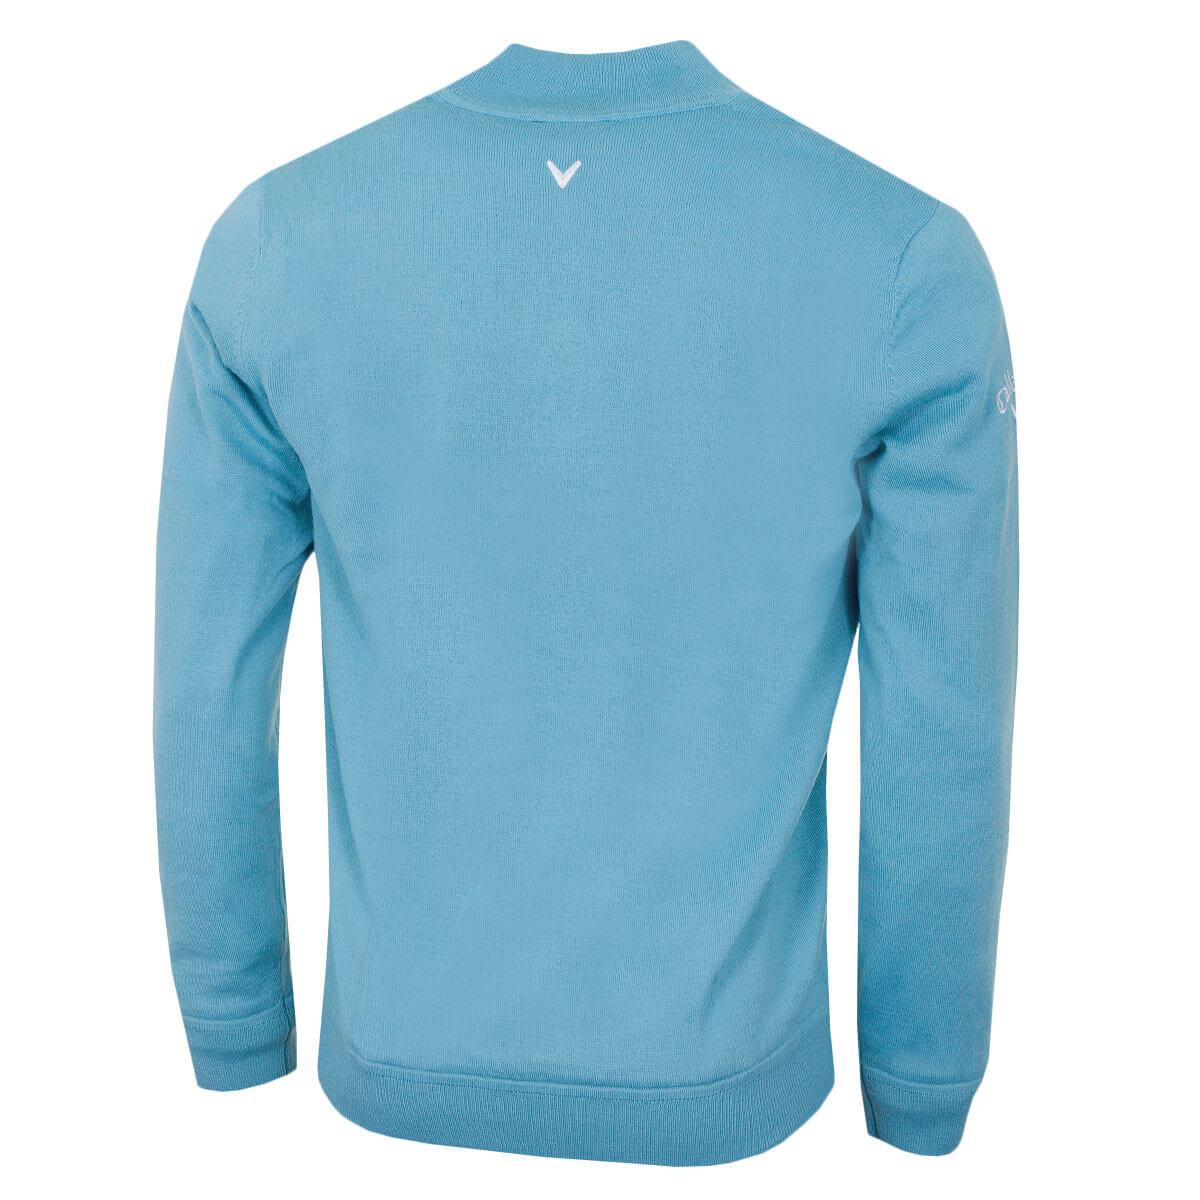 Callaway-Golf-Mens-1-4-Zip-Mock-Merino-Windproof-Sweater-Pullover-43-OFF-RRP thumbnail 6